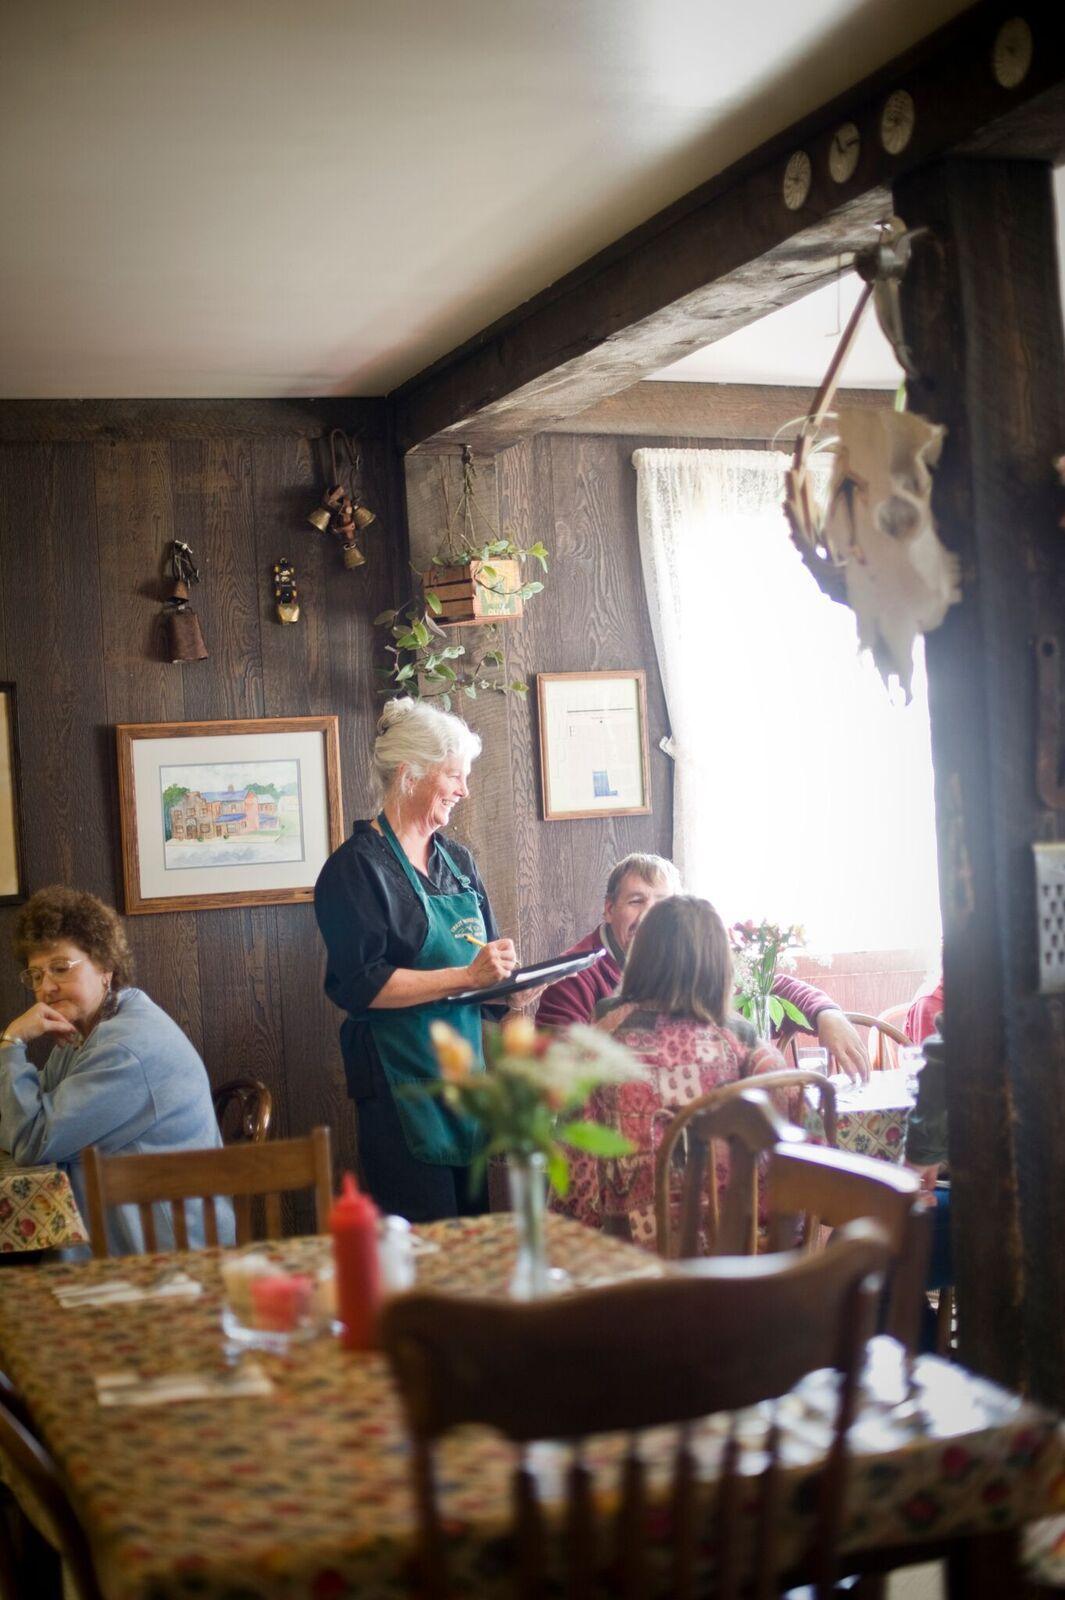 The last best plates martinsdales crazy mountain inn is top the last best plates martinsdales crazy mountain inn is top mothers day dining destination food missoulian kristyandbryce Gallery